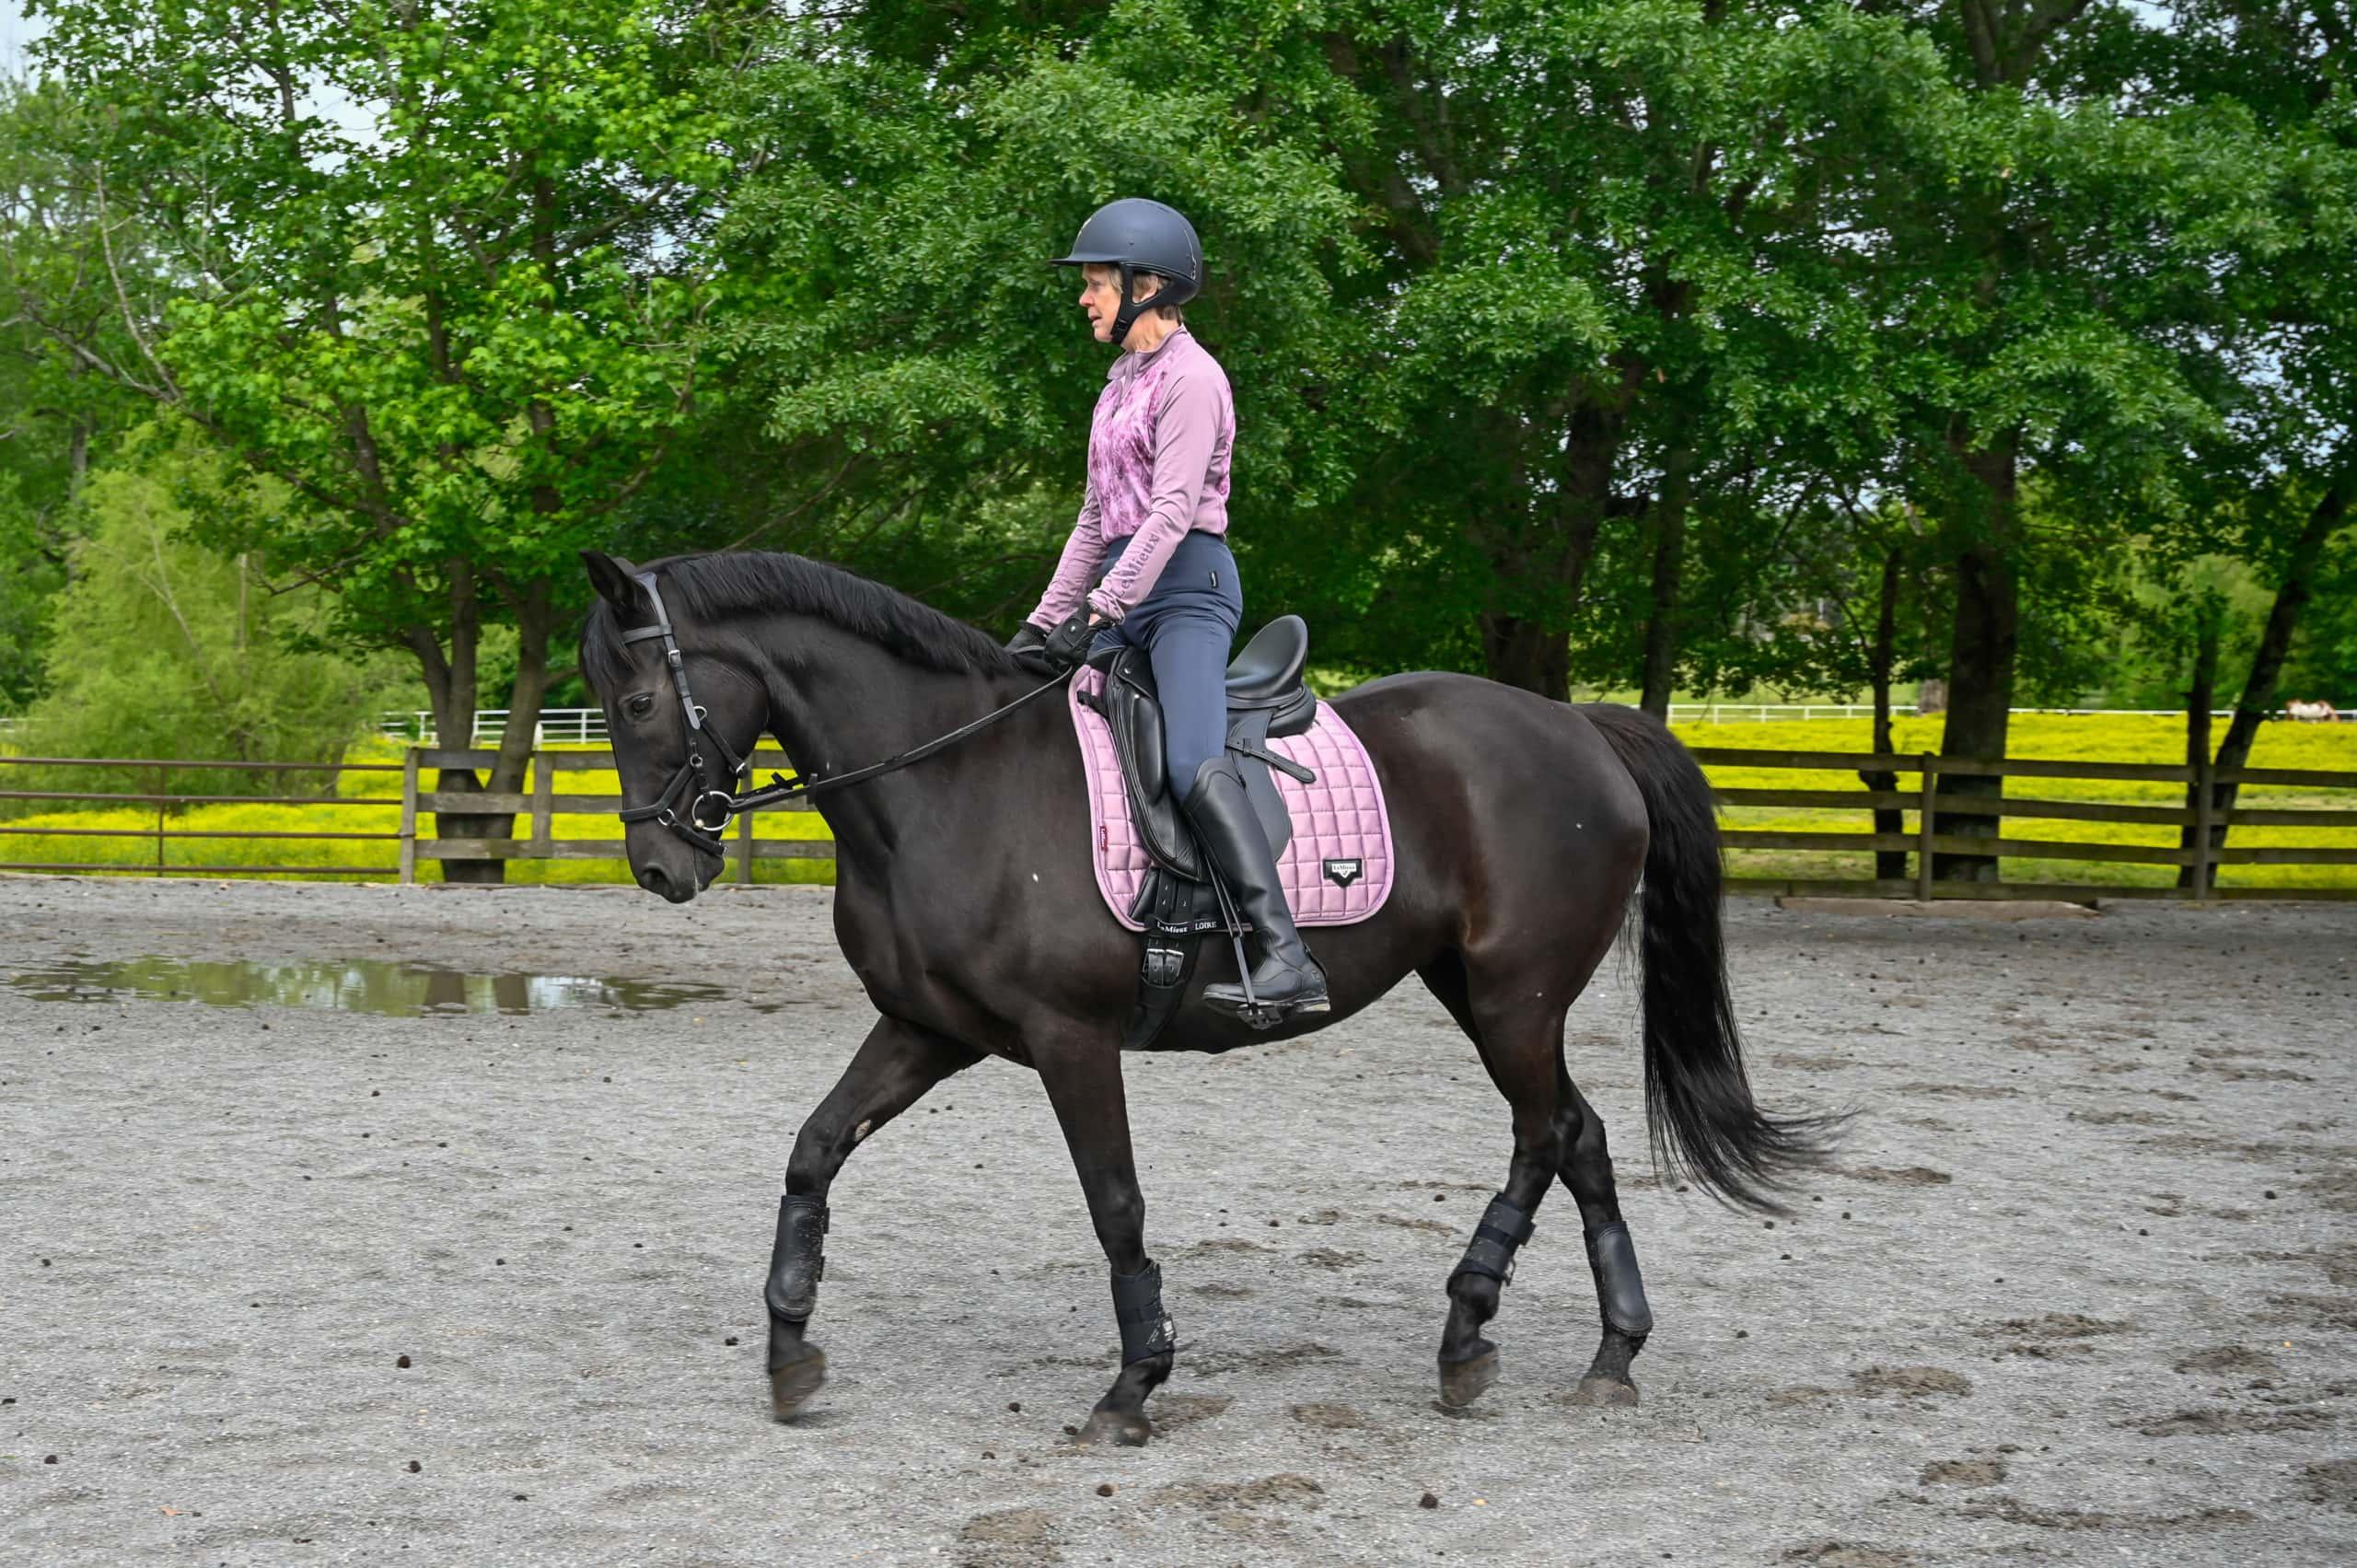 Porter riding Jitterbug Dancer